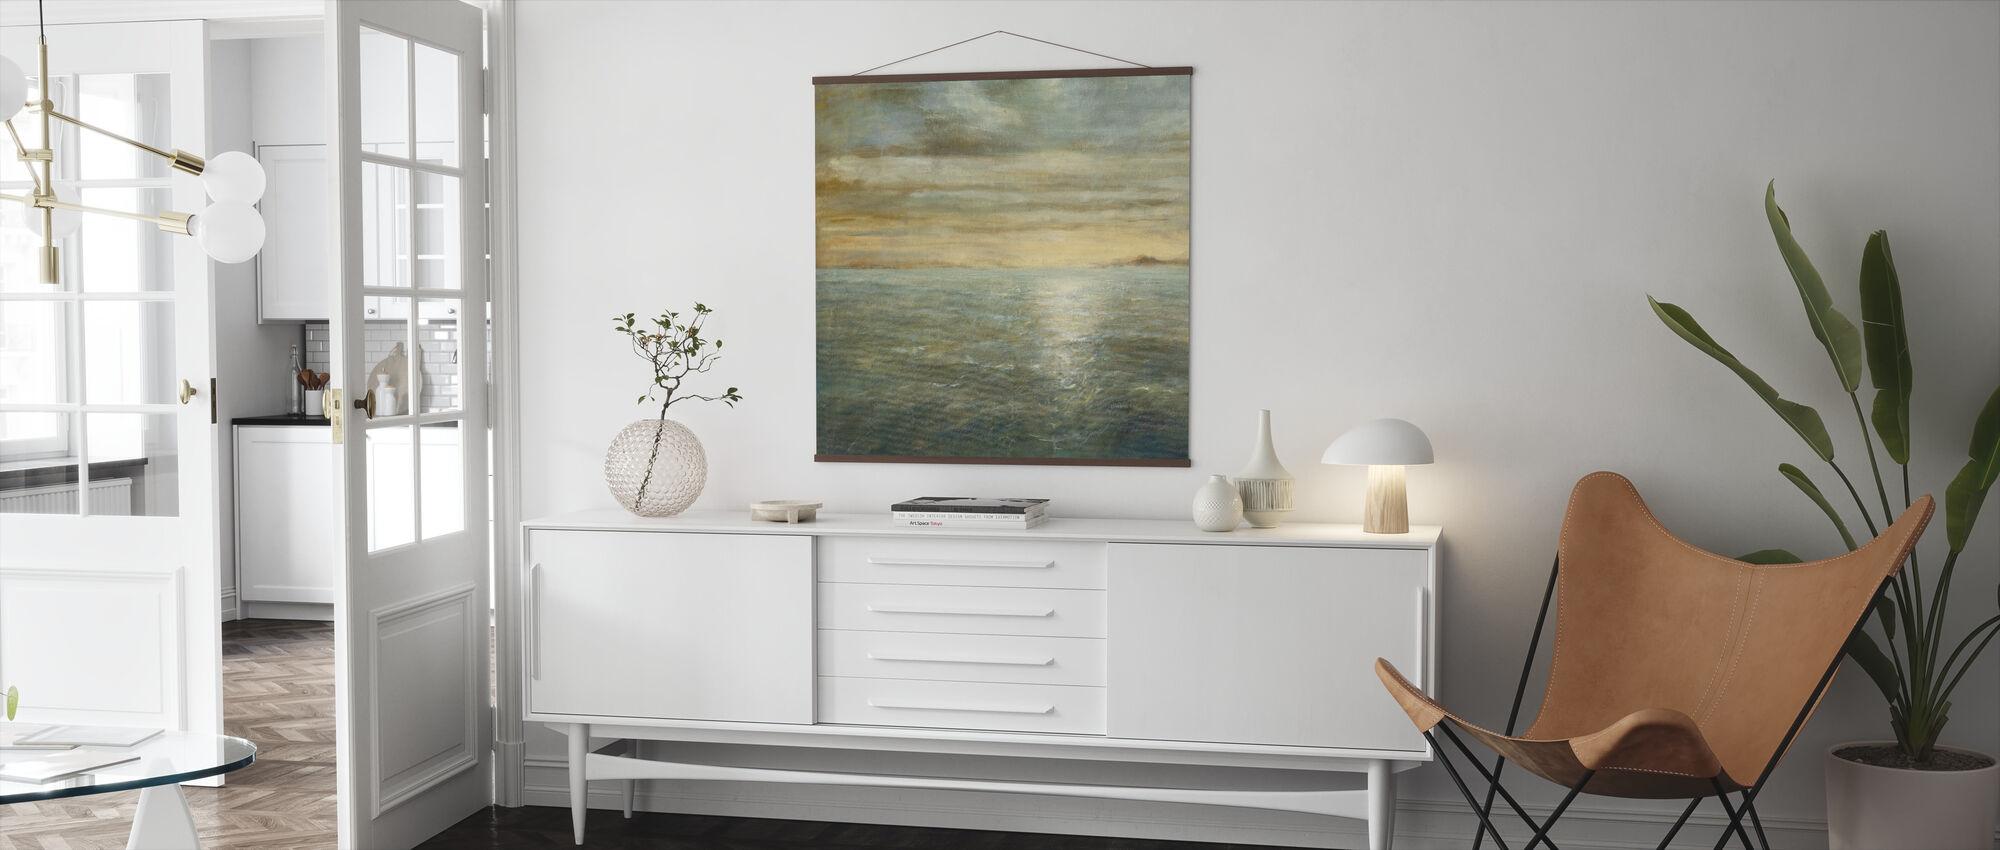 Serene Sea - Poster - Living Room